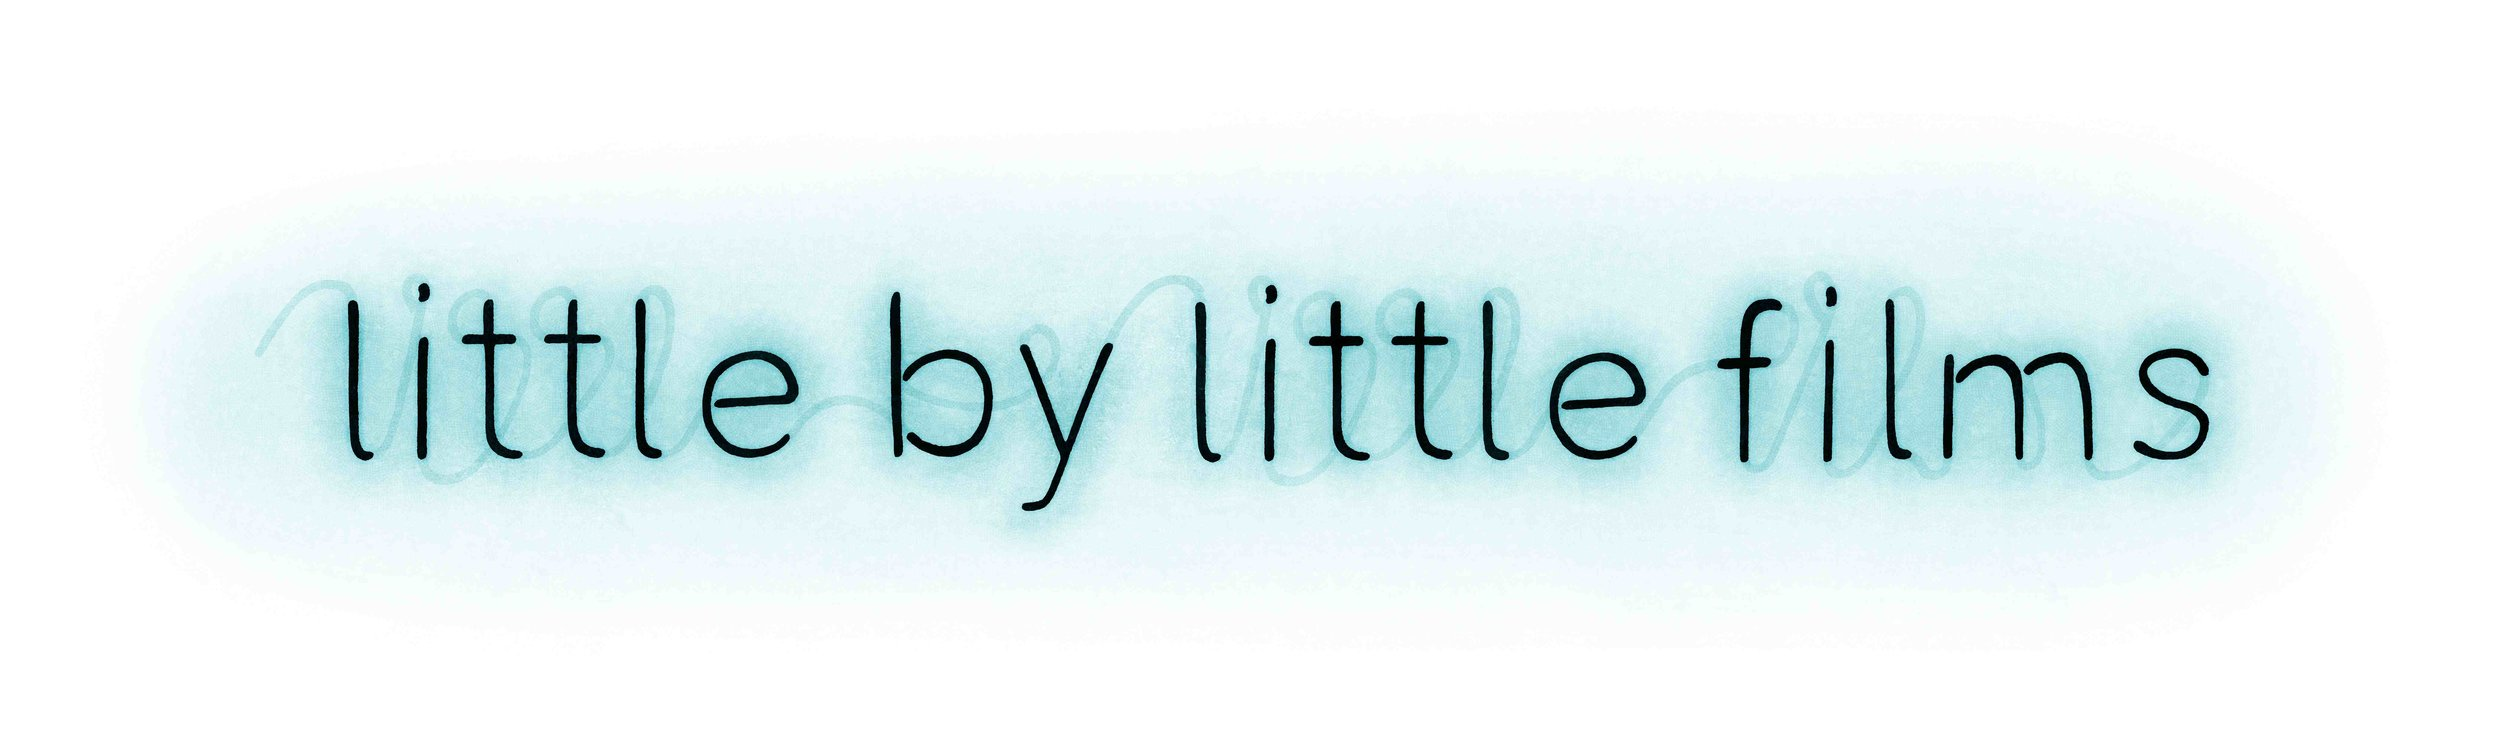 Little by little films logo white small.jpg